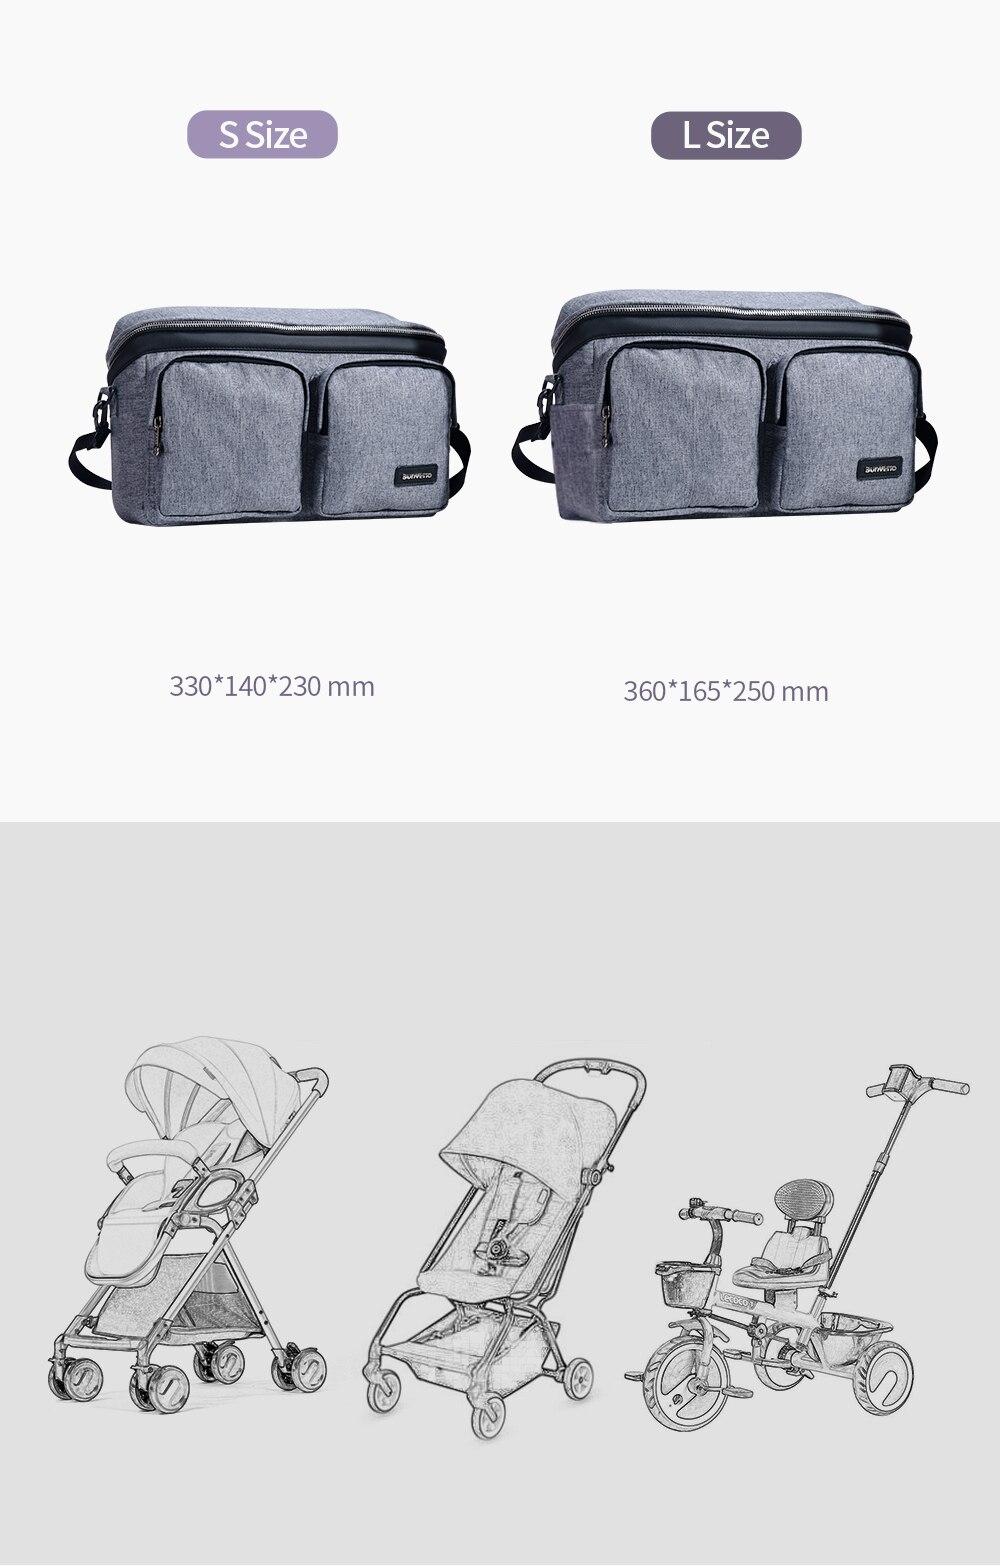 SUNVENO Diaper Bag For Baby Stuff Nappy Bag Stroller Organizer Baby Bag Mom Travel Hanging Carriage Pram Buggy Cart Bottle Bag